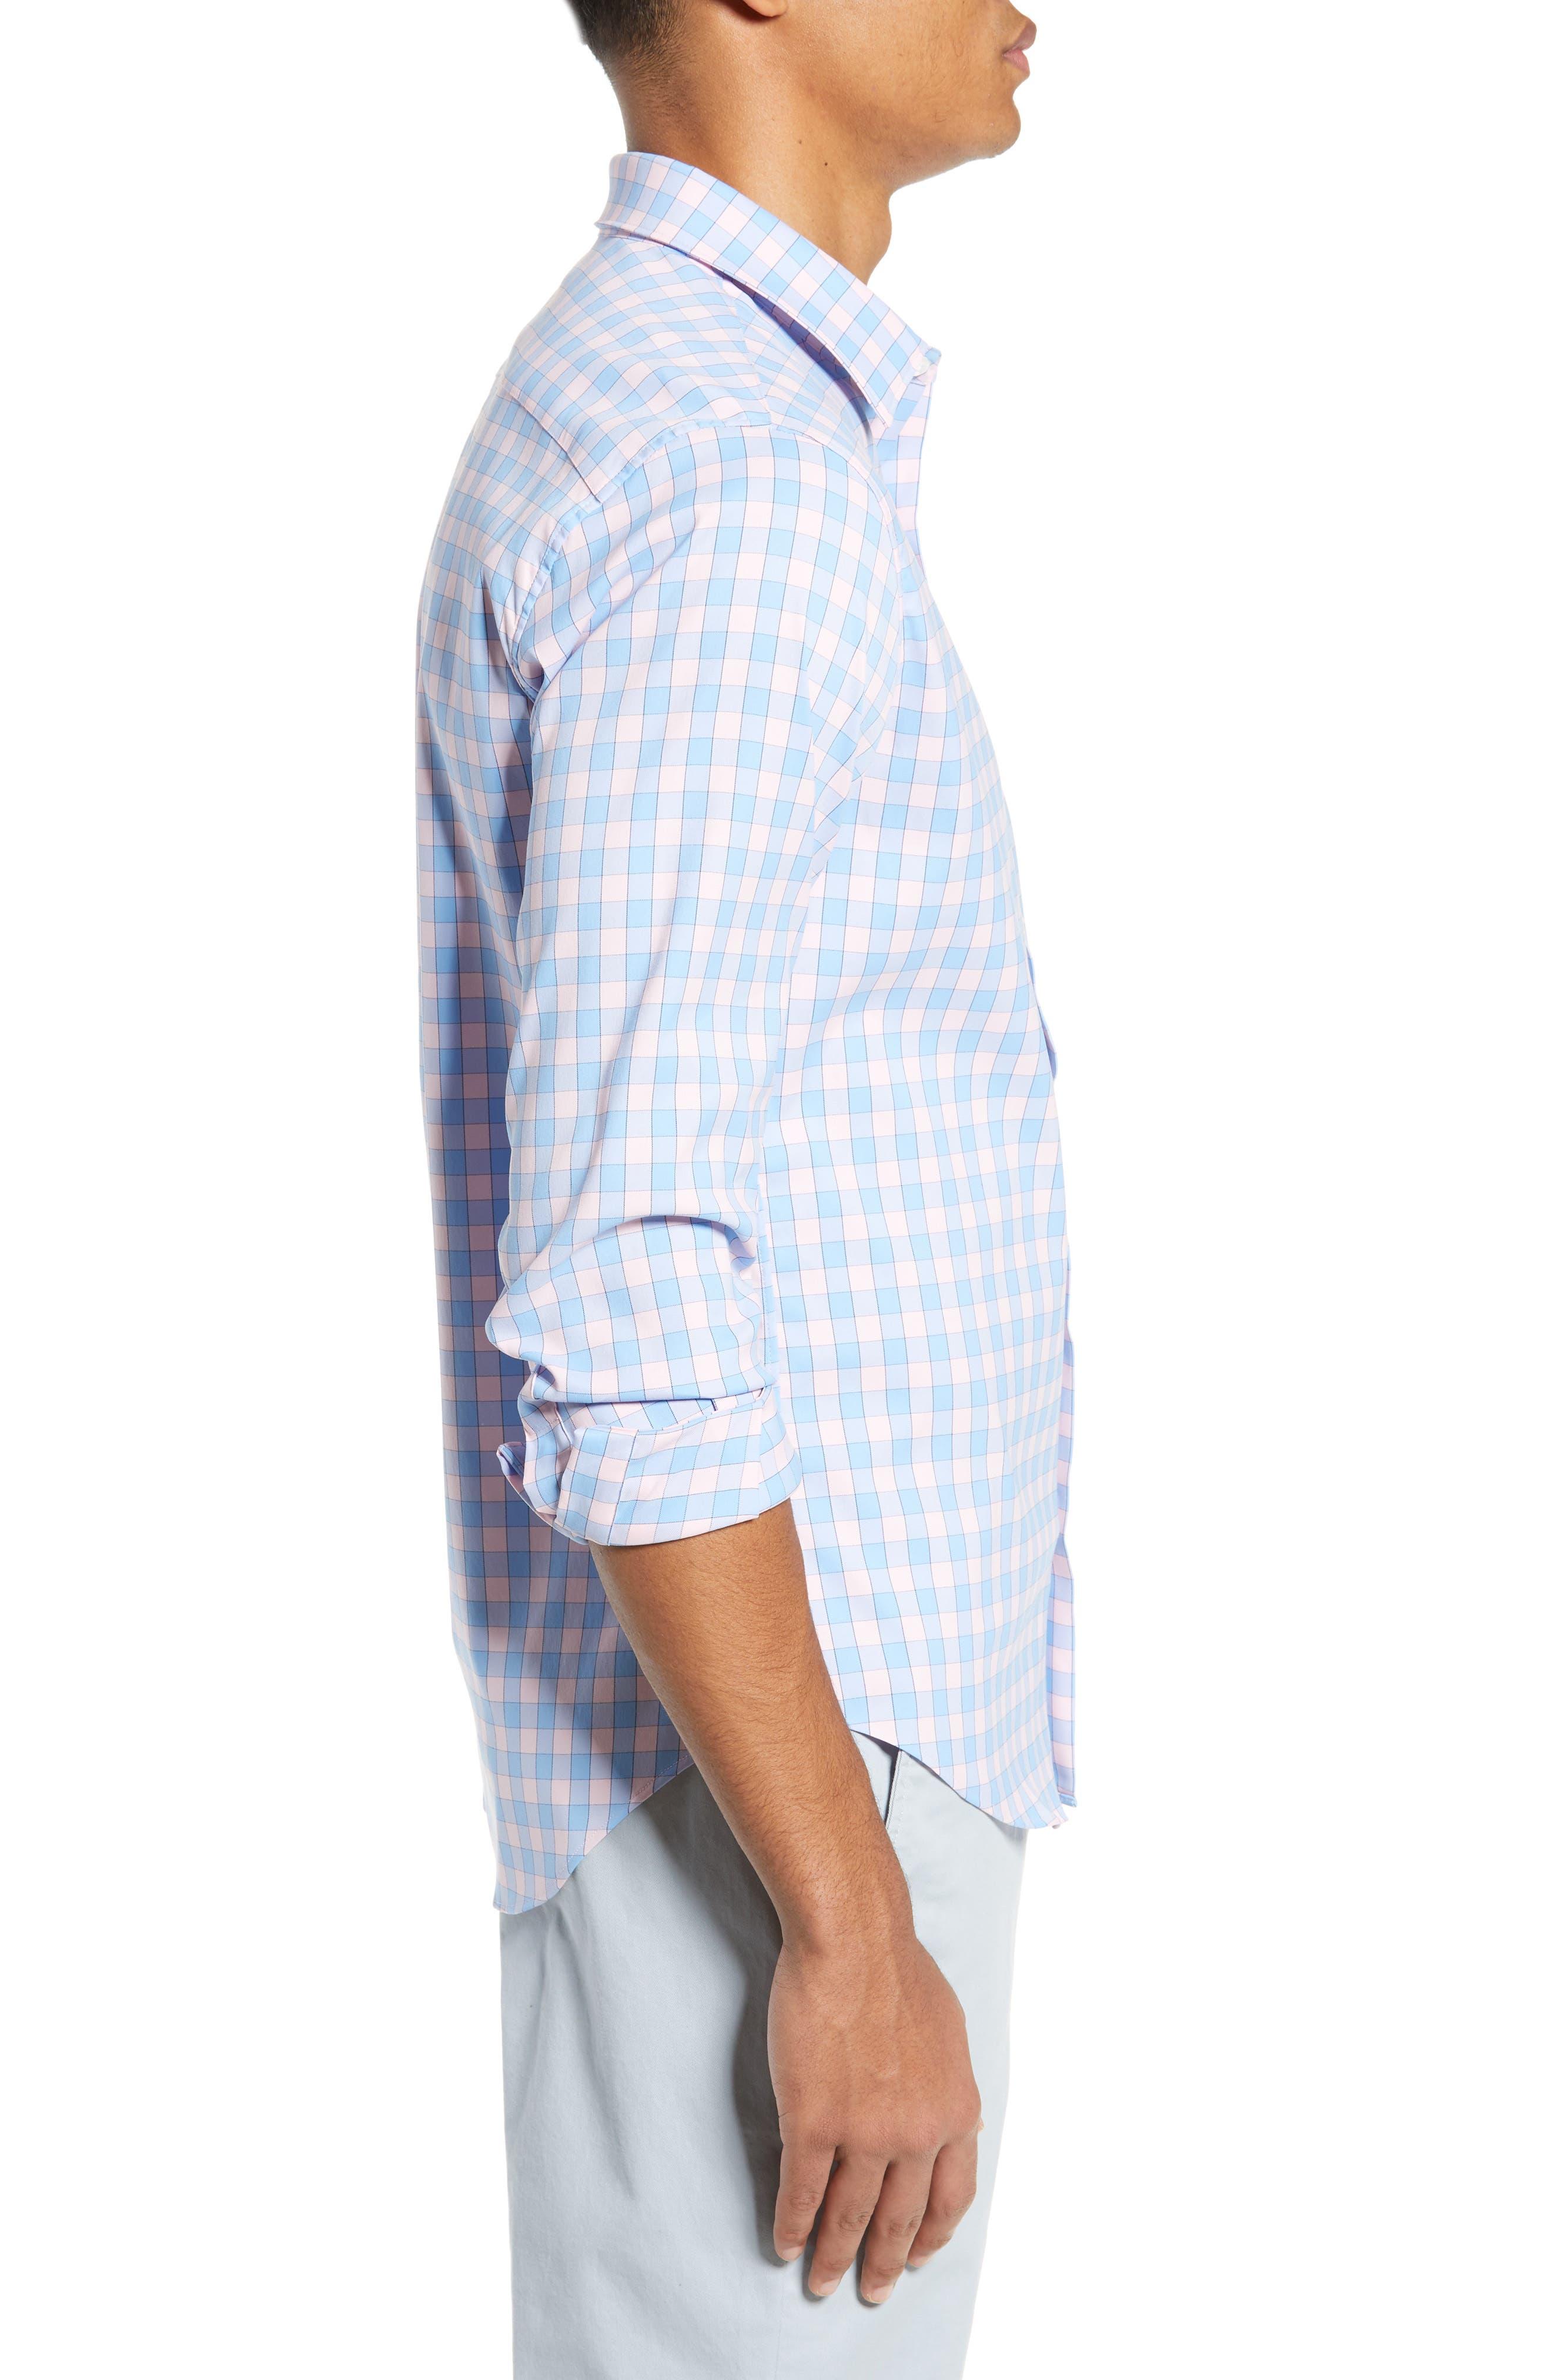 BONOBOS, Slim Fit Check Tech Sport Shirt, Alternate thumbnail 4, color, SAIL BOAT FIRST BLUSH